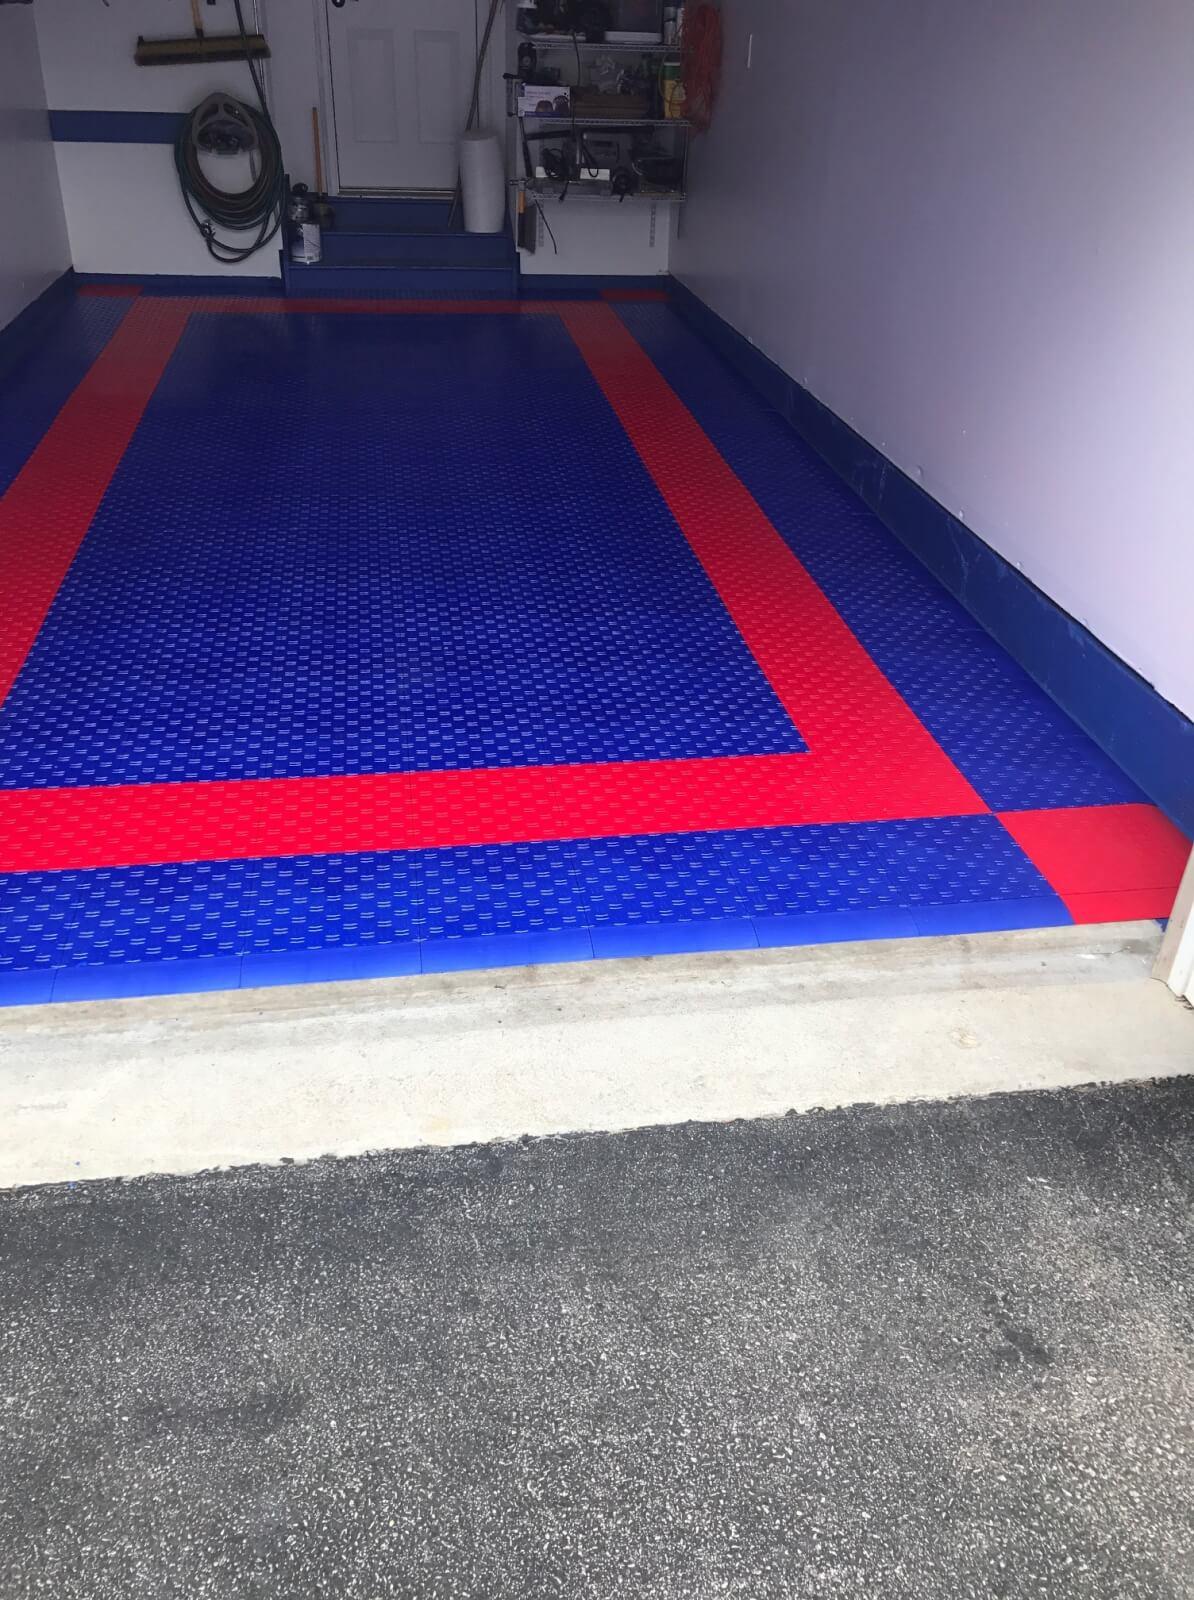 How to install carpet tiles in garage home the honoroak red blue hd diamond interlocking garage floor tiles dailygadgetfo Gallery